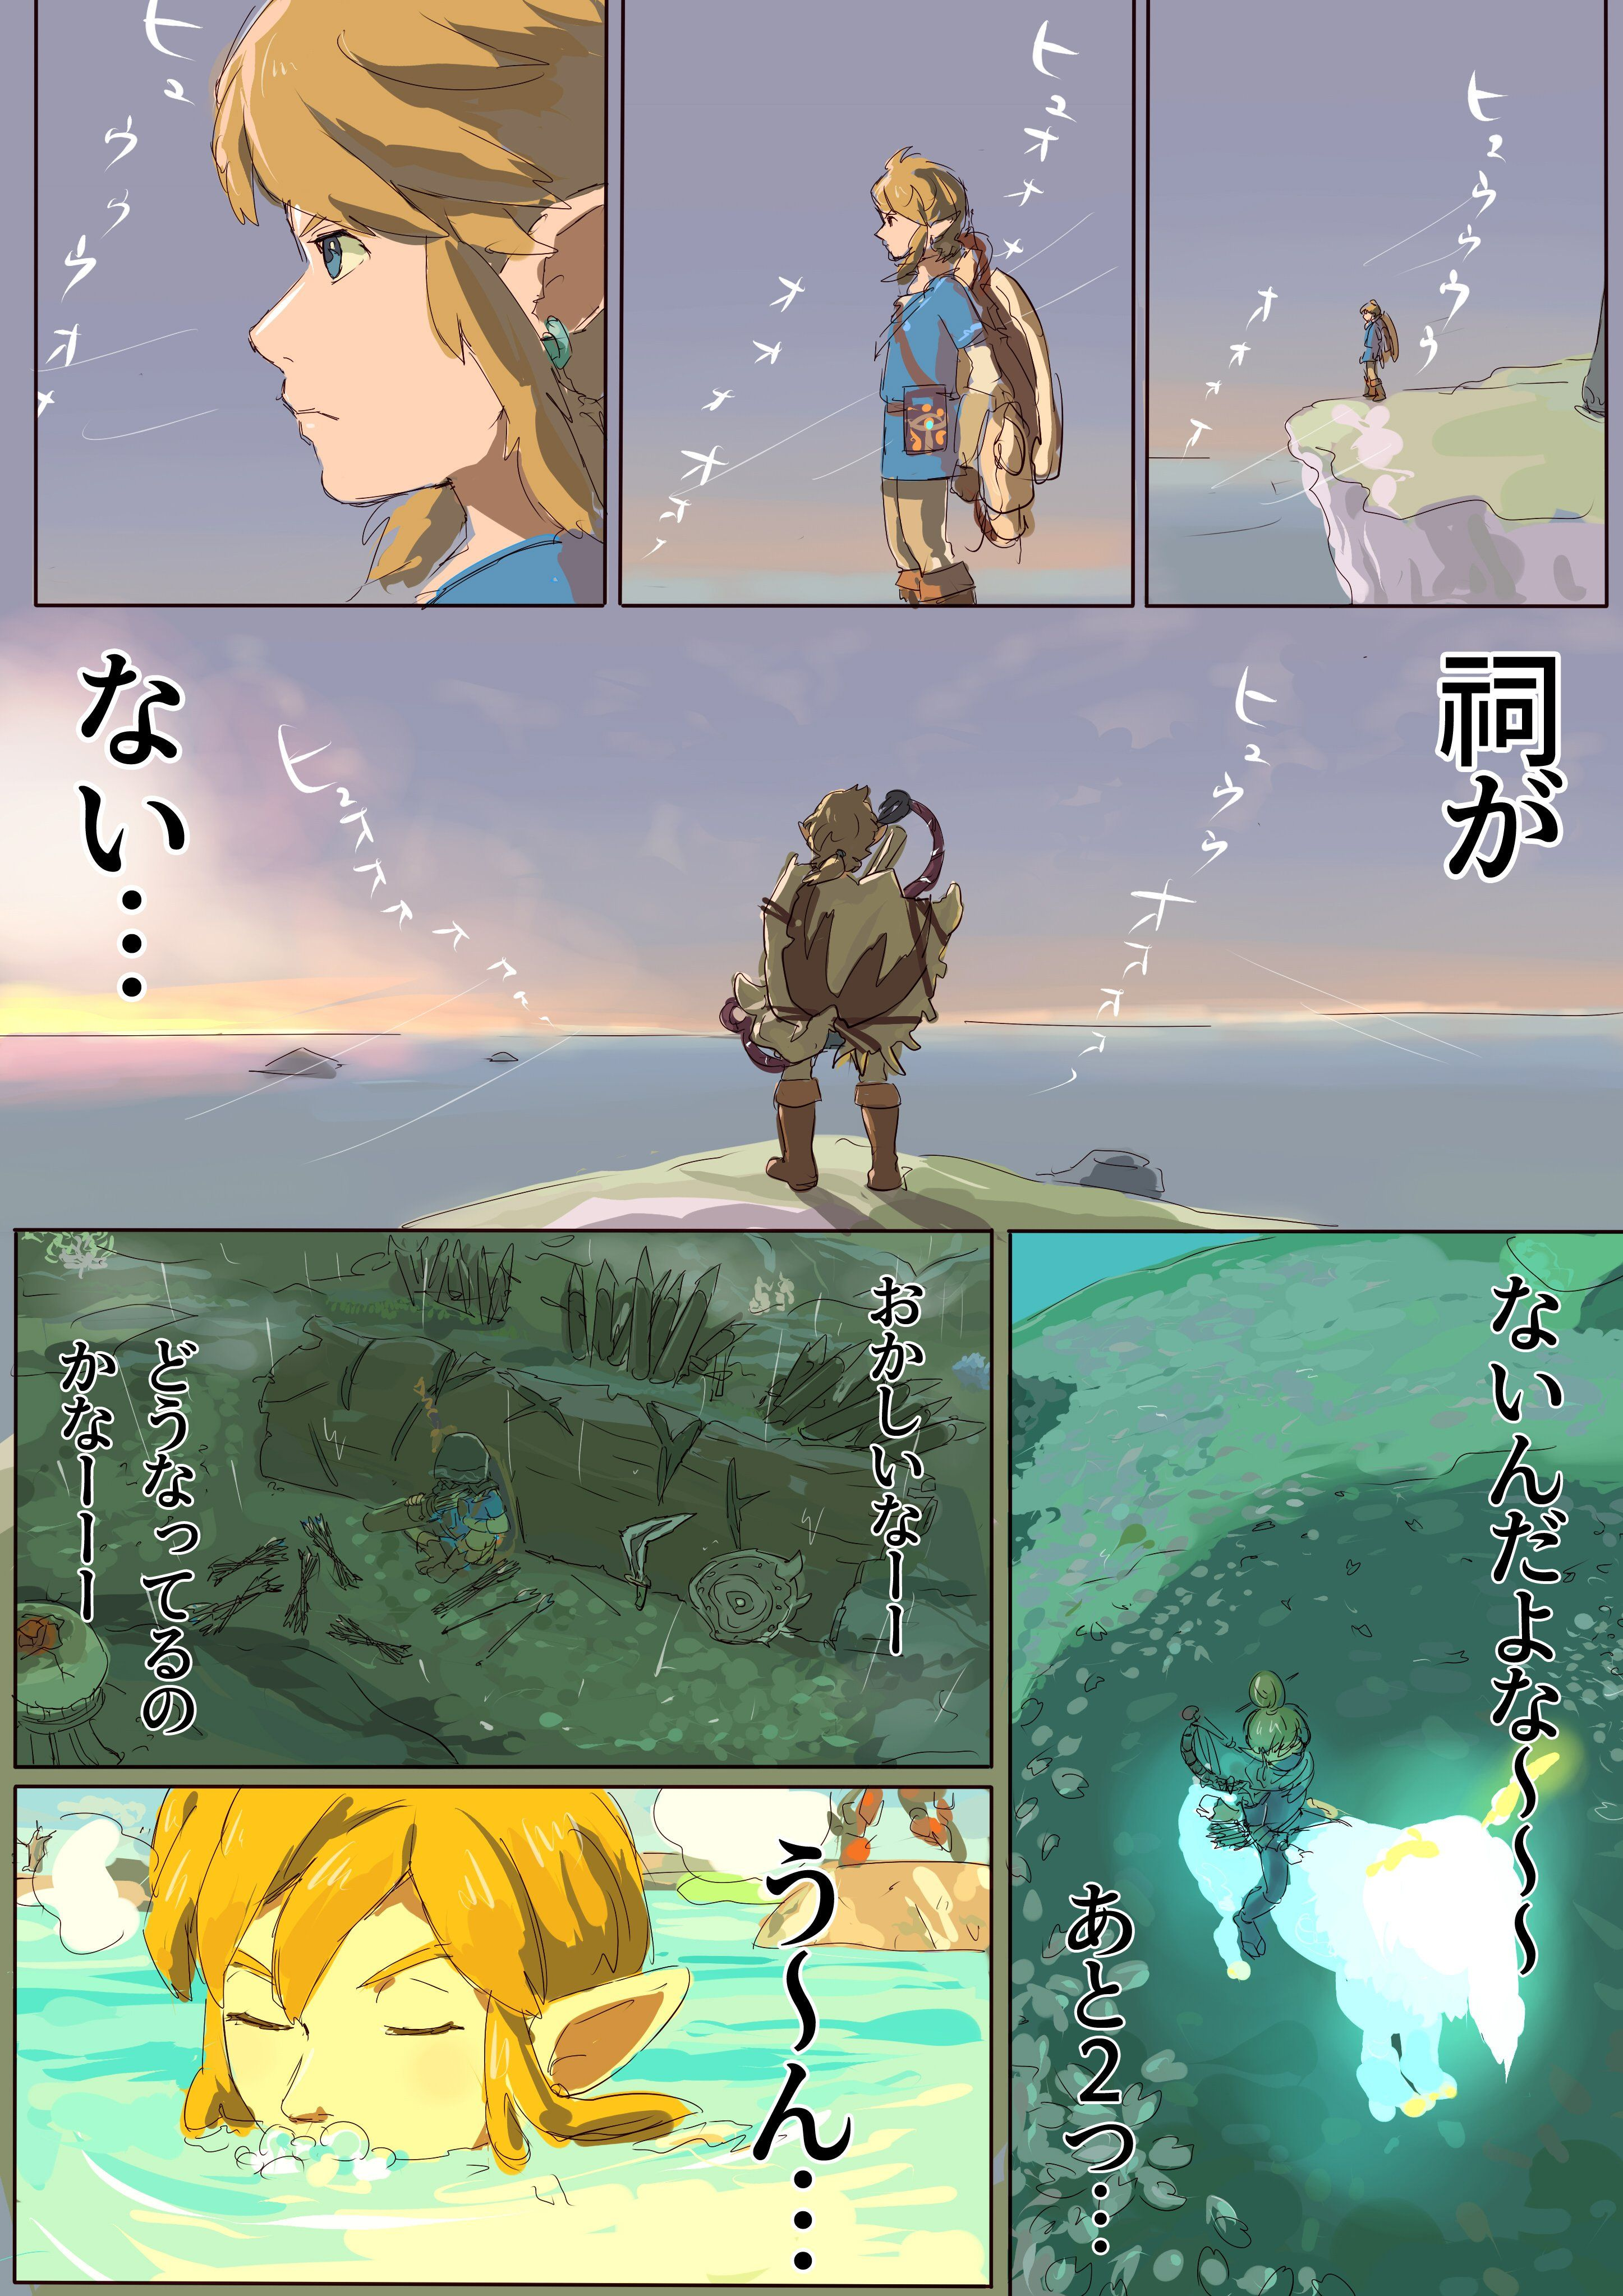 Pin by ウォルフ on Link ♡ >w< | Legend of zelda, Legend of zelda ...